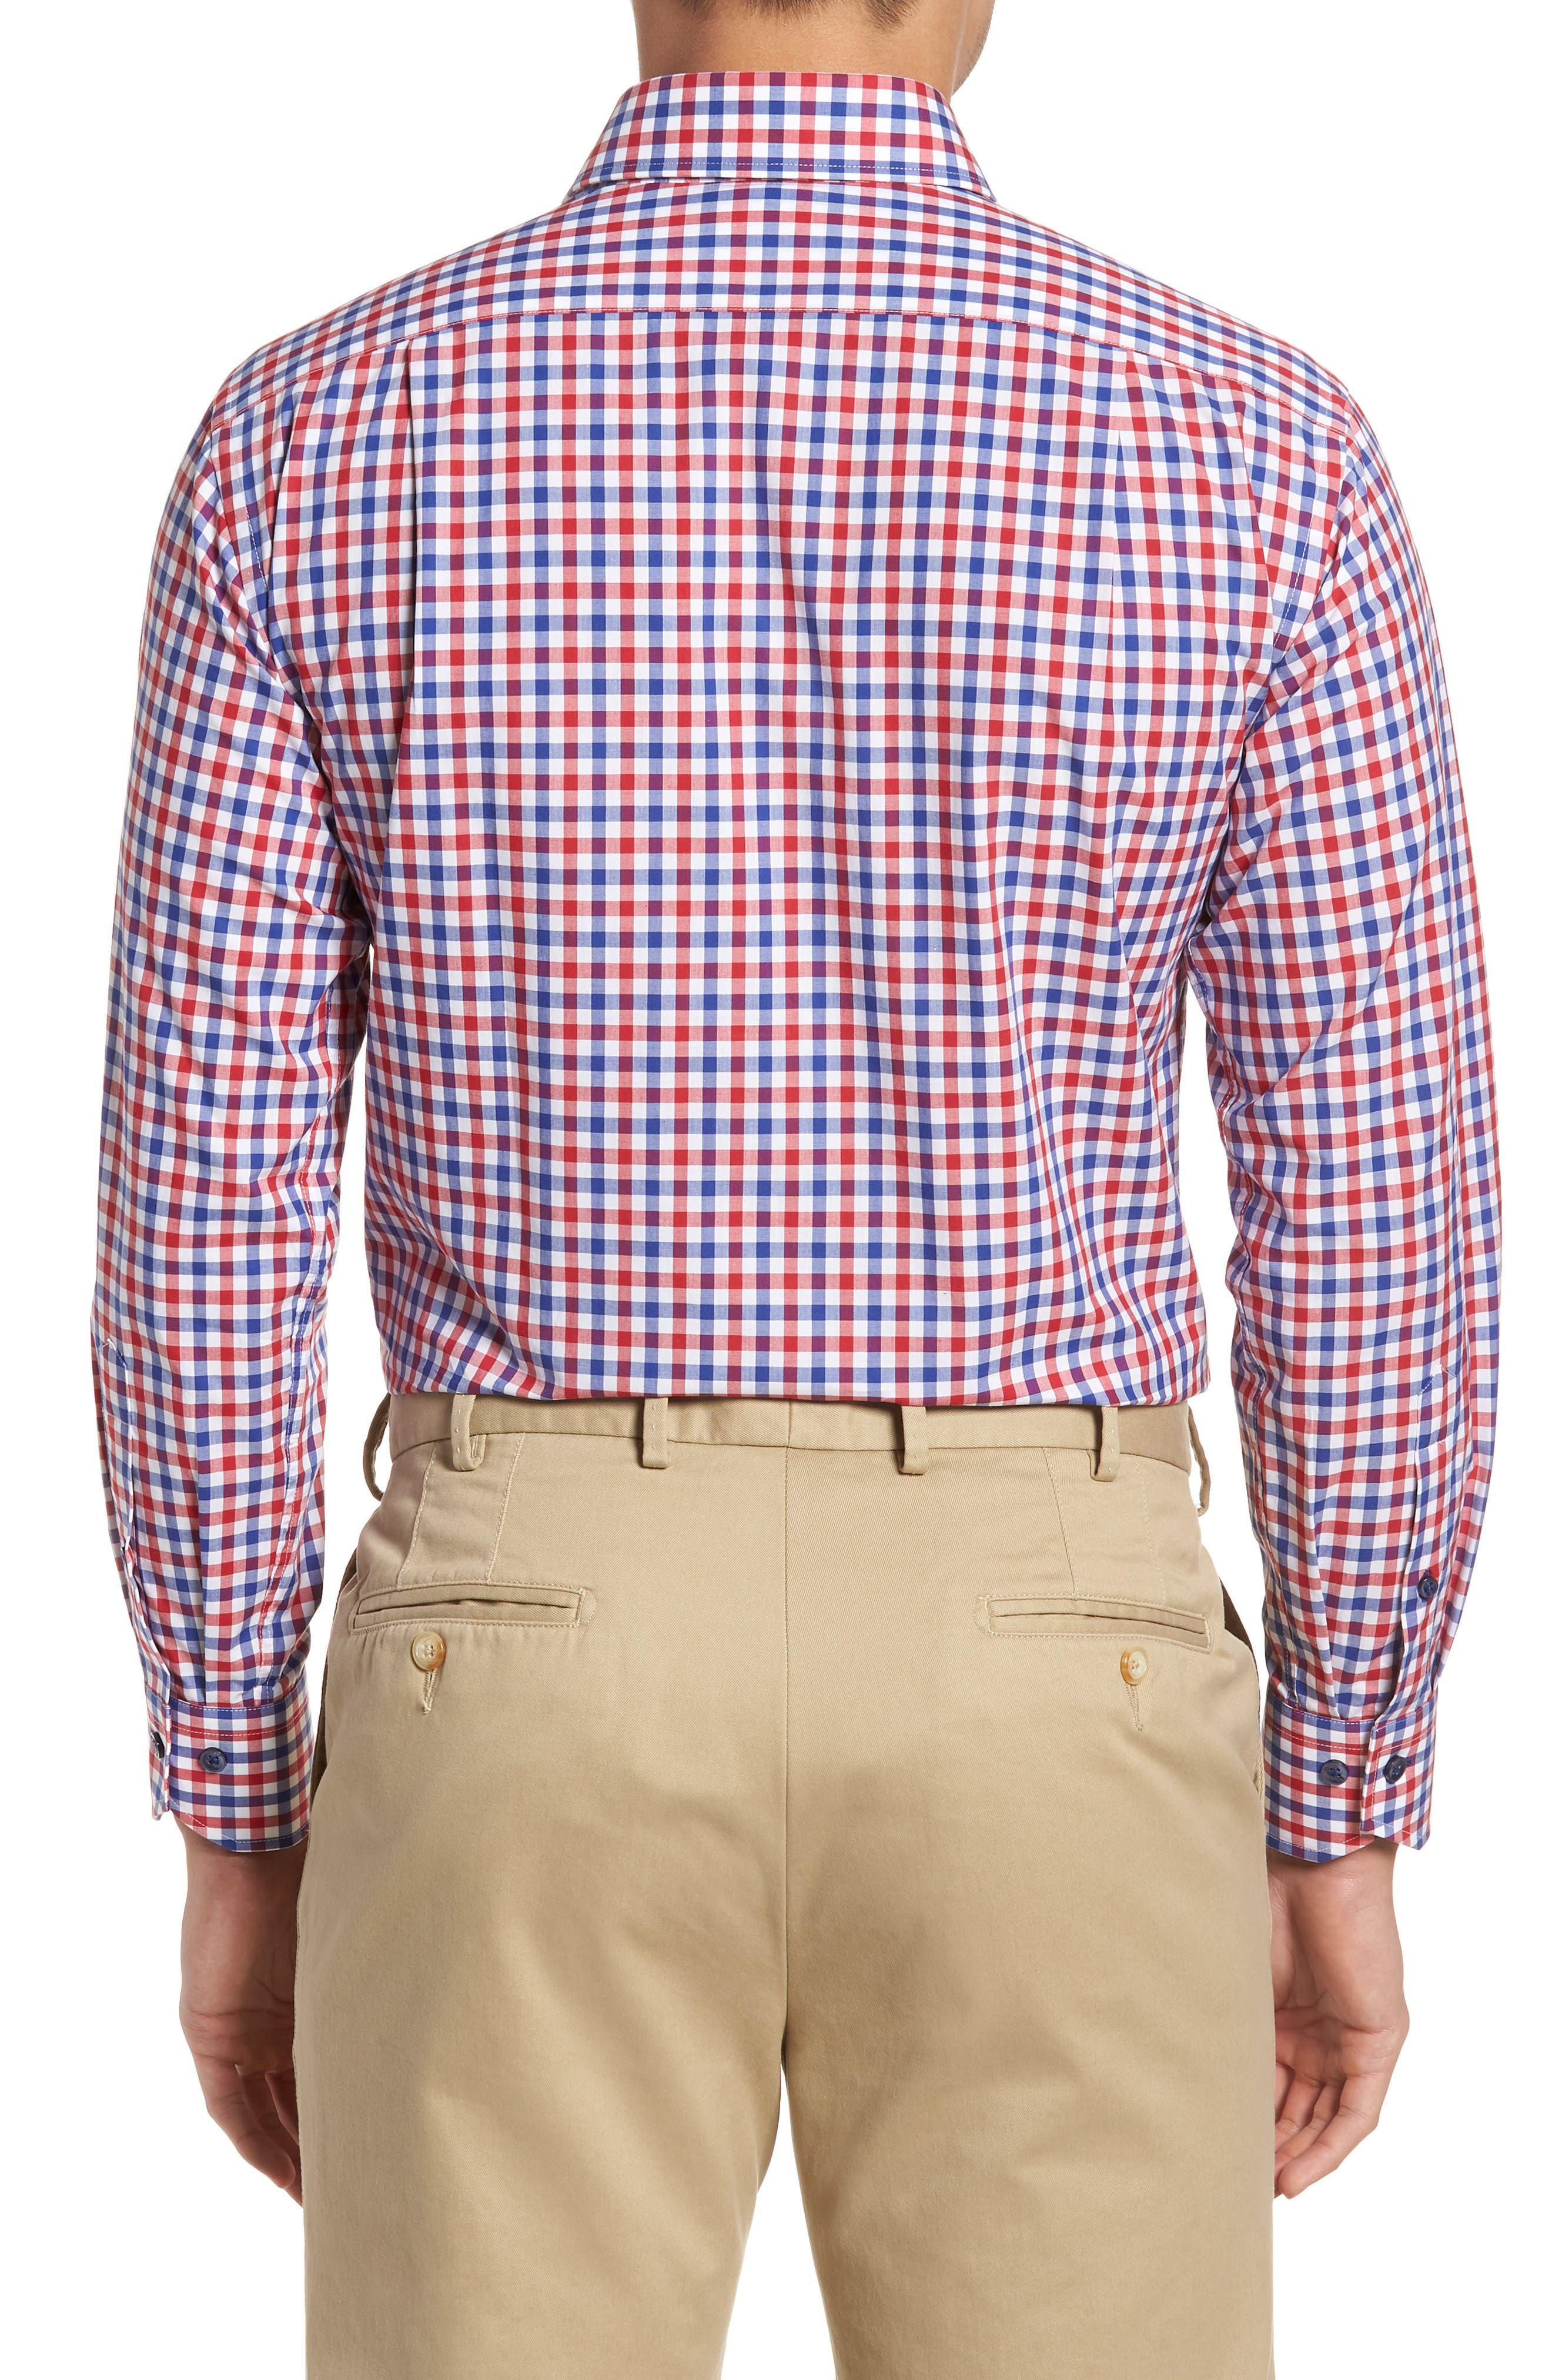 Trim Fit Check Dress Shirt,                             Alternate thumbnail 3, color,                             Navy/ Red